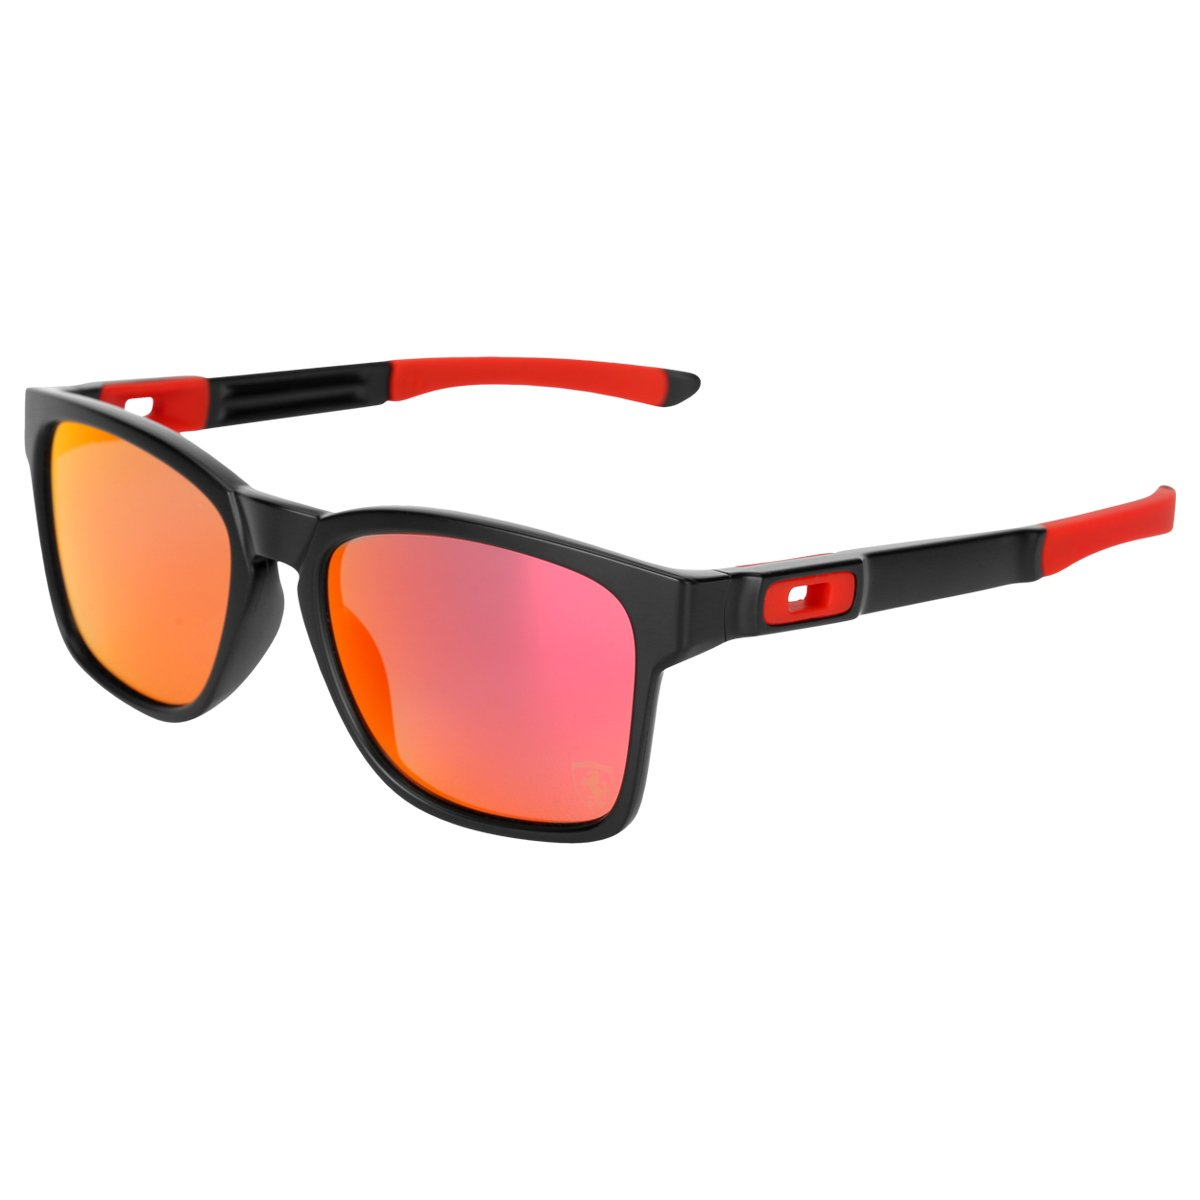 bb0110f46b60b Óculos Oakley Catalyst Matte Black Ruby Iridium Ferrari